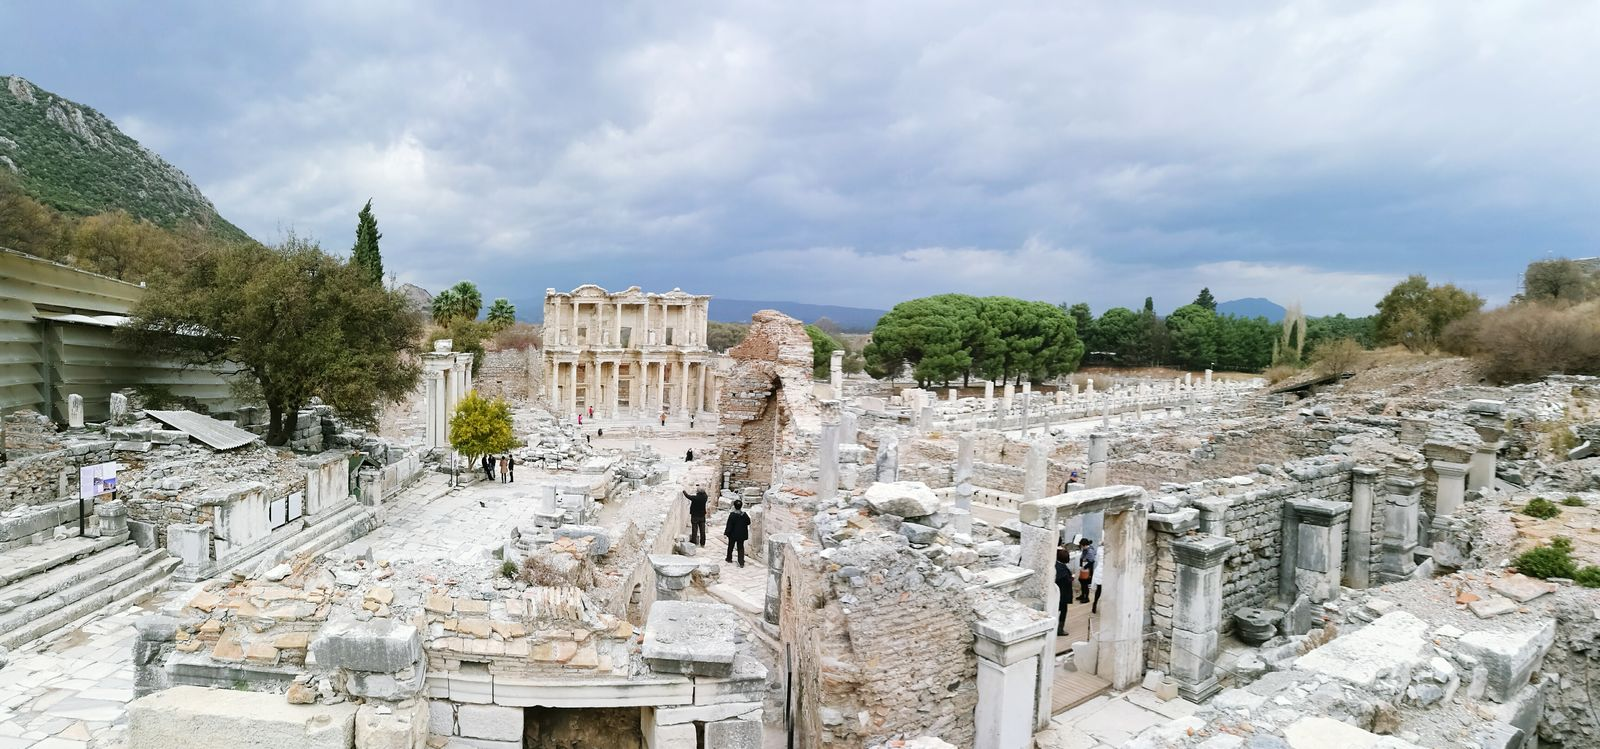 Amazing View Ephesus Ruins Ephesus Roman History Turkey Exciting Ephesus - Turkey Greek History Helenistik Wonderful View